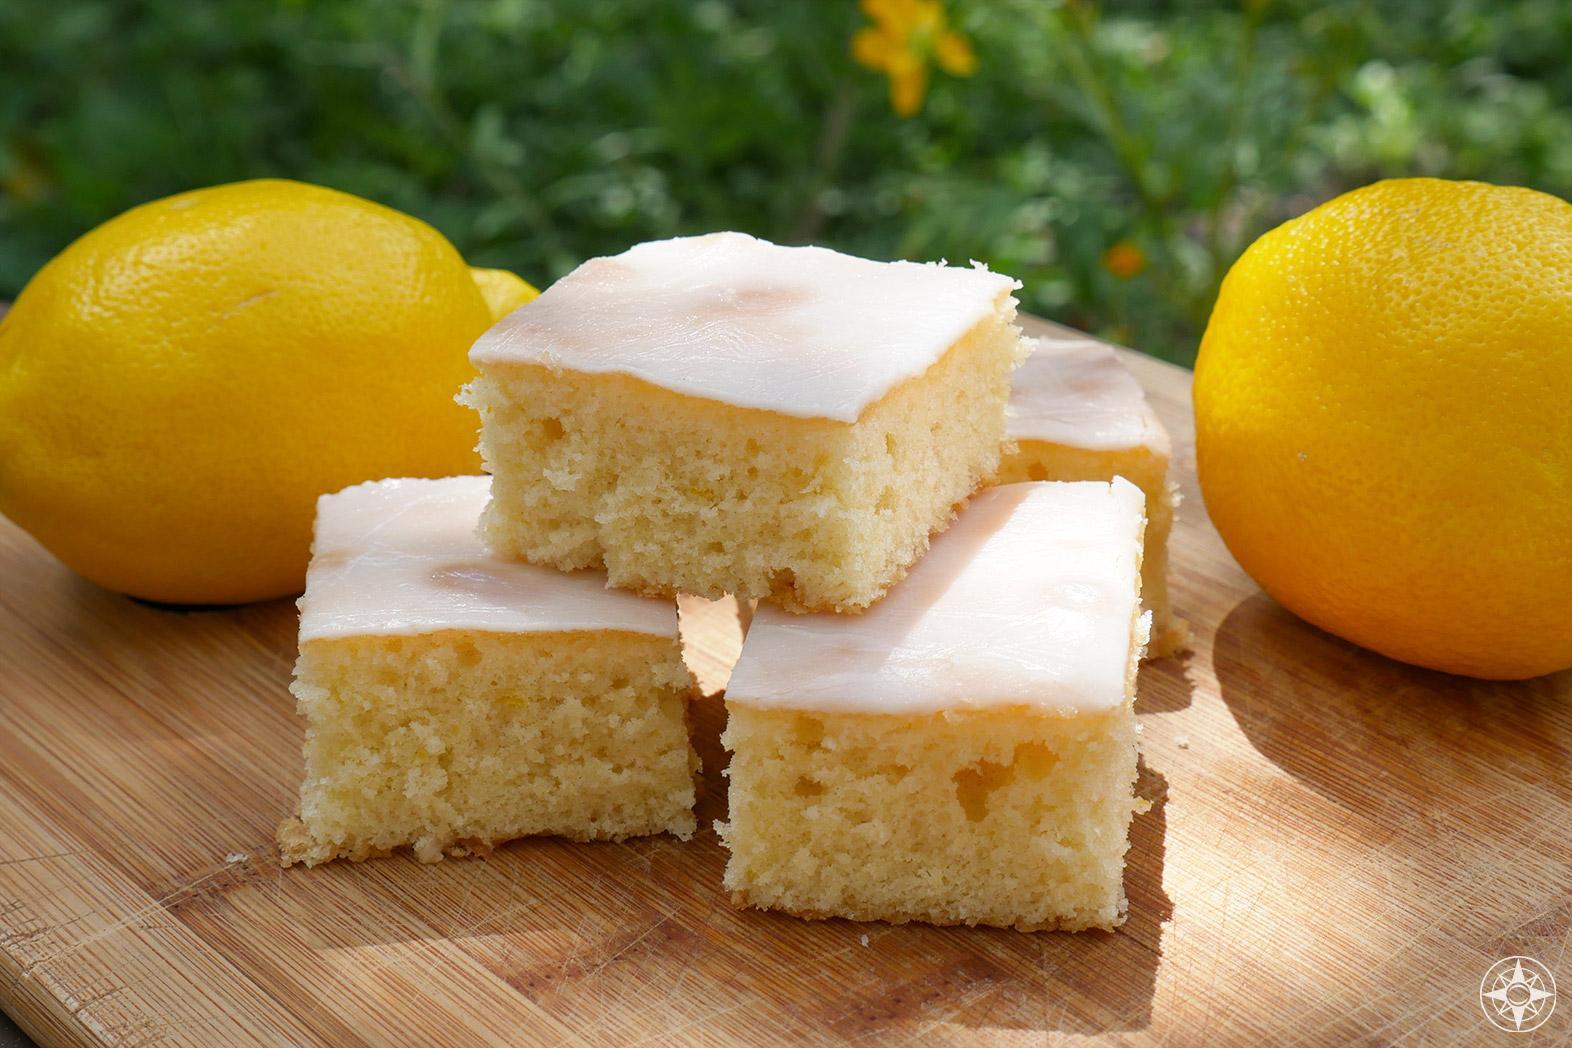 Oma's German lemon sheet cake, Zitronenkuchen, lemon icing, easy, quick, light, airy, picnic-ready - Oma's Rezept, grandma's recipe, deutsch, Kuchen, Happier Place